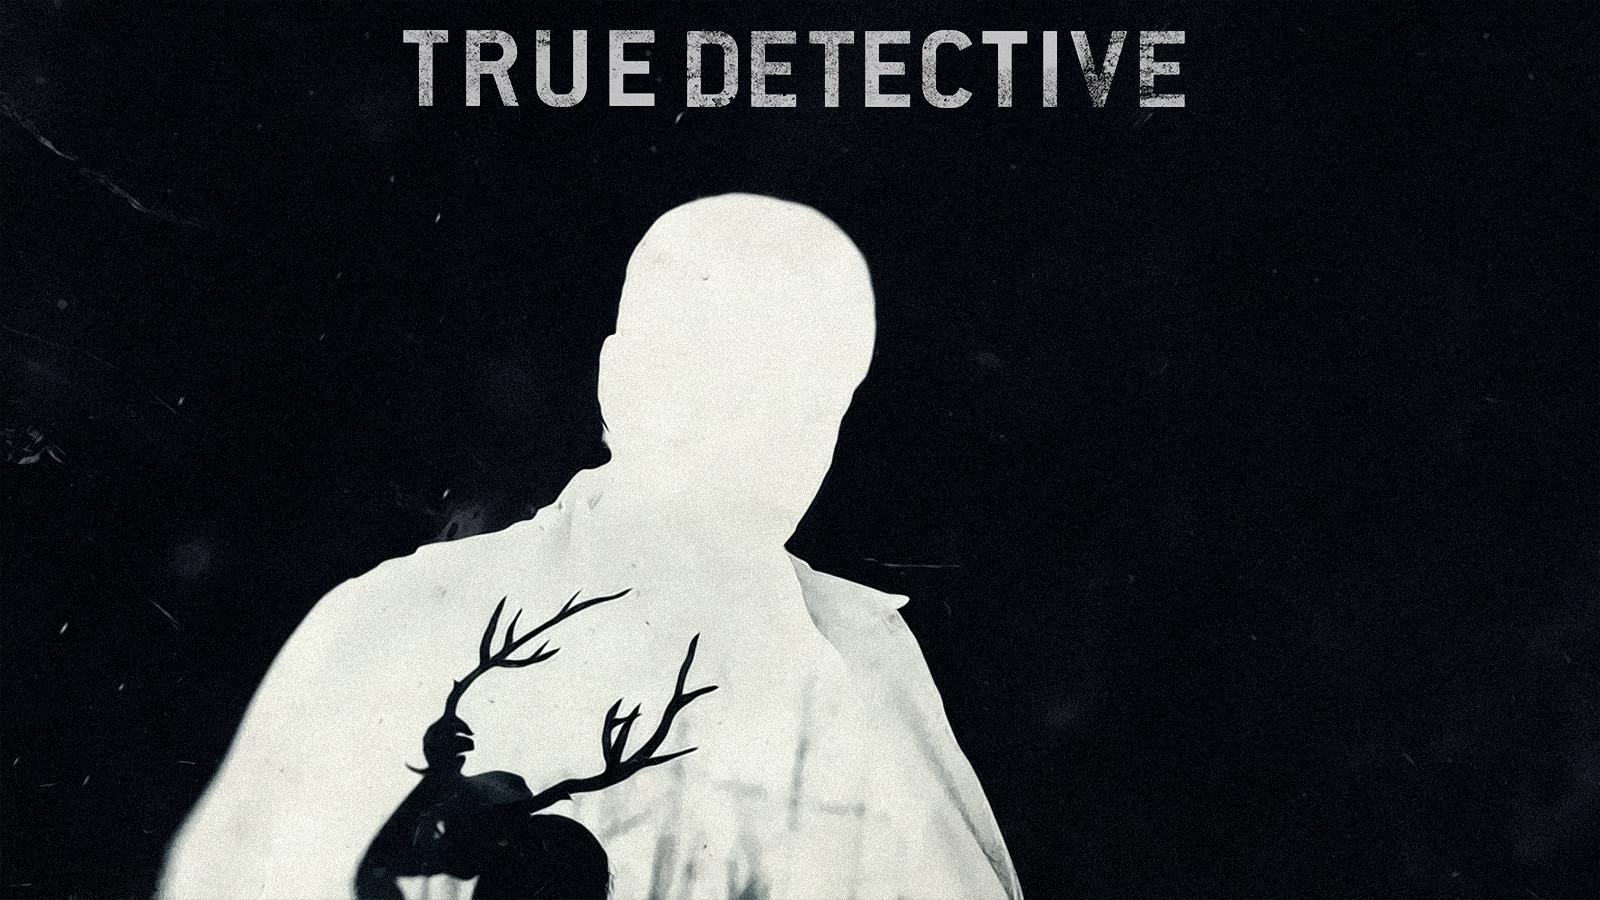 HBO Officially Announces Colin Farrell and Vince Vaughn for True Detective: Season 2